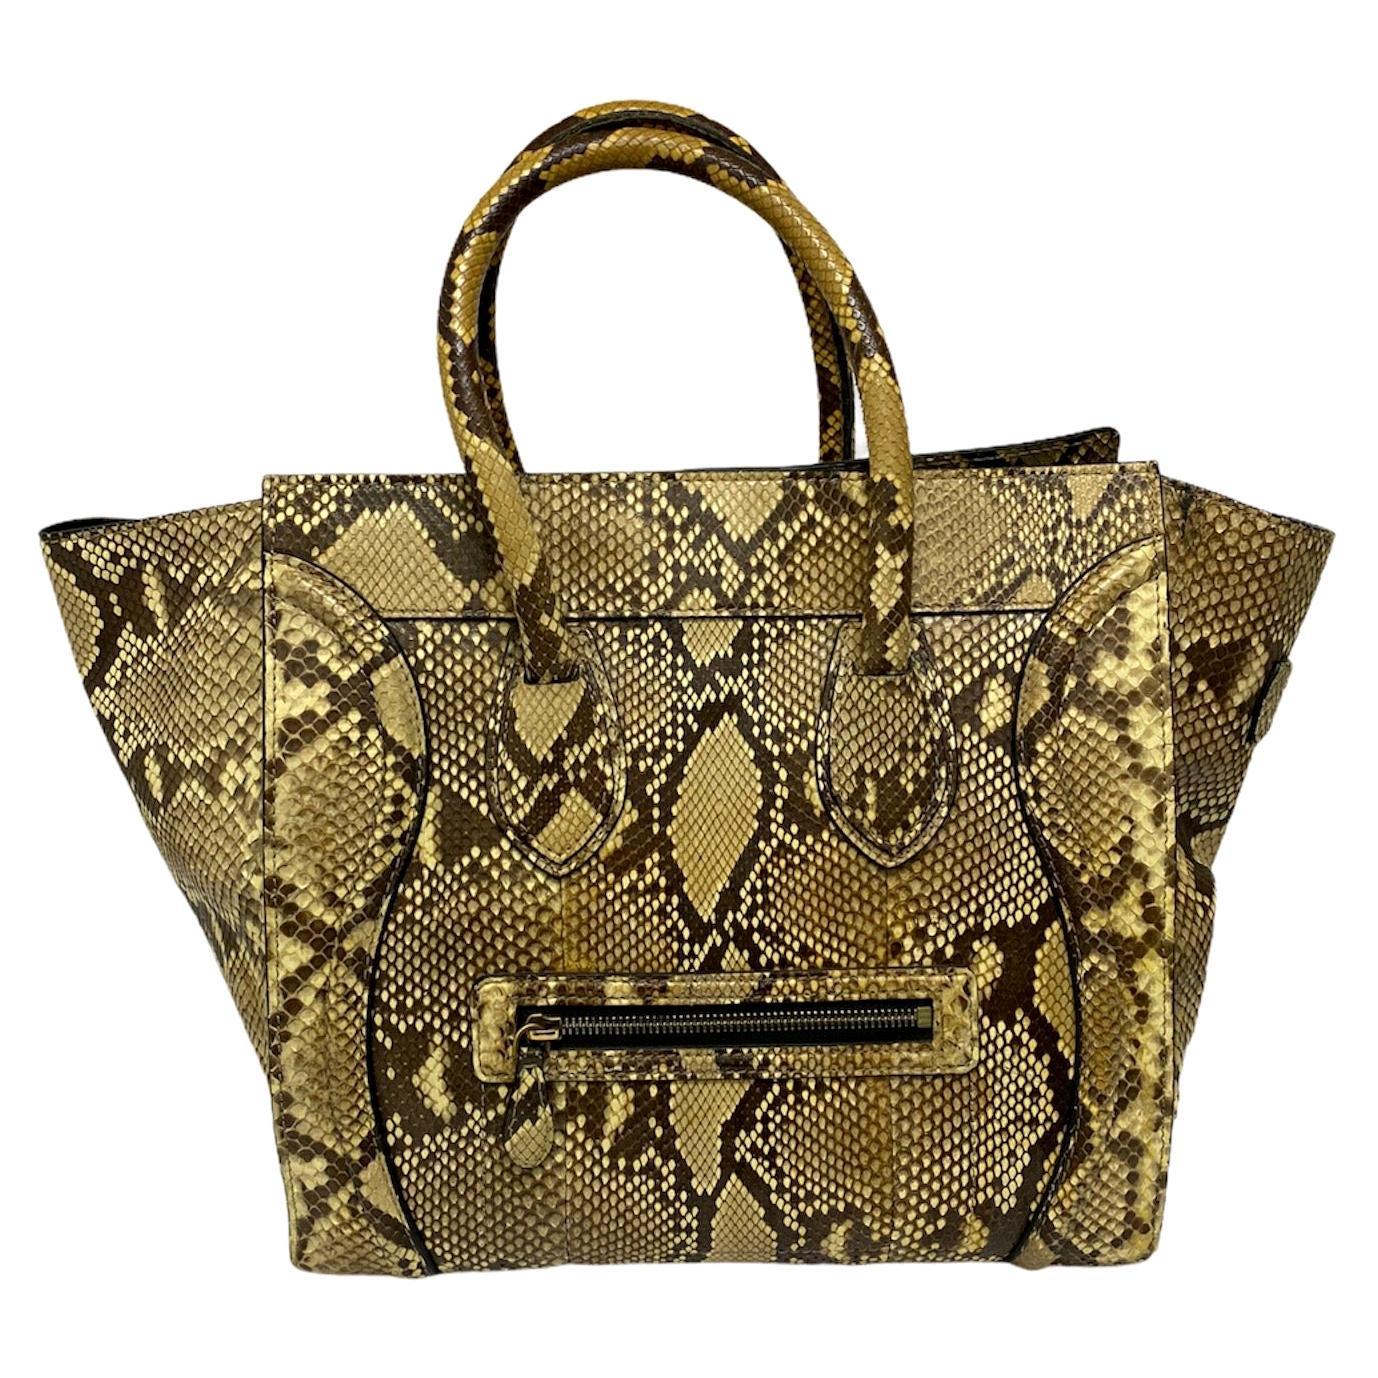 Celine Beige Leather Luggage Bag